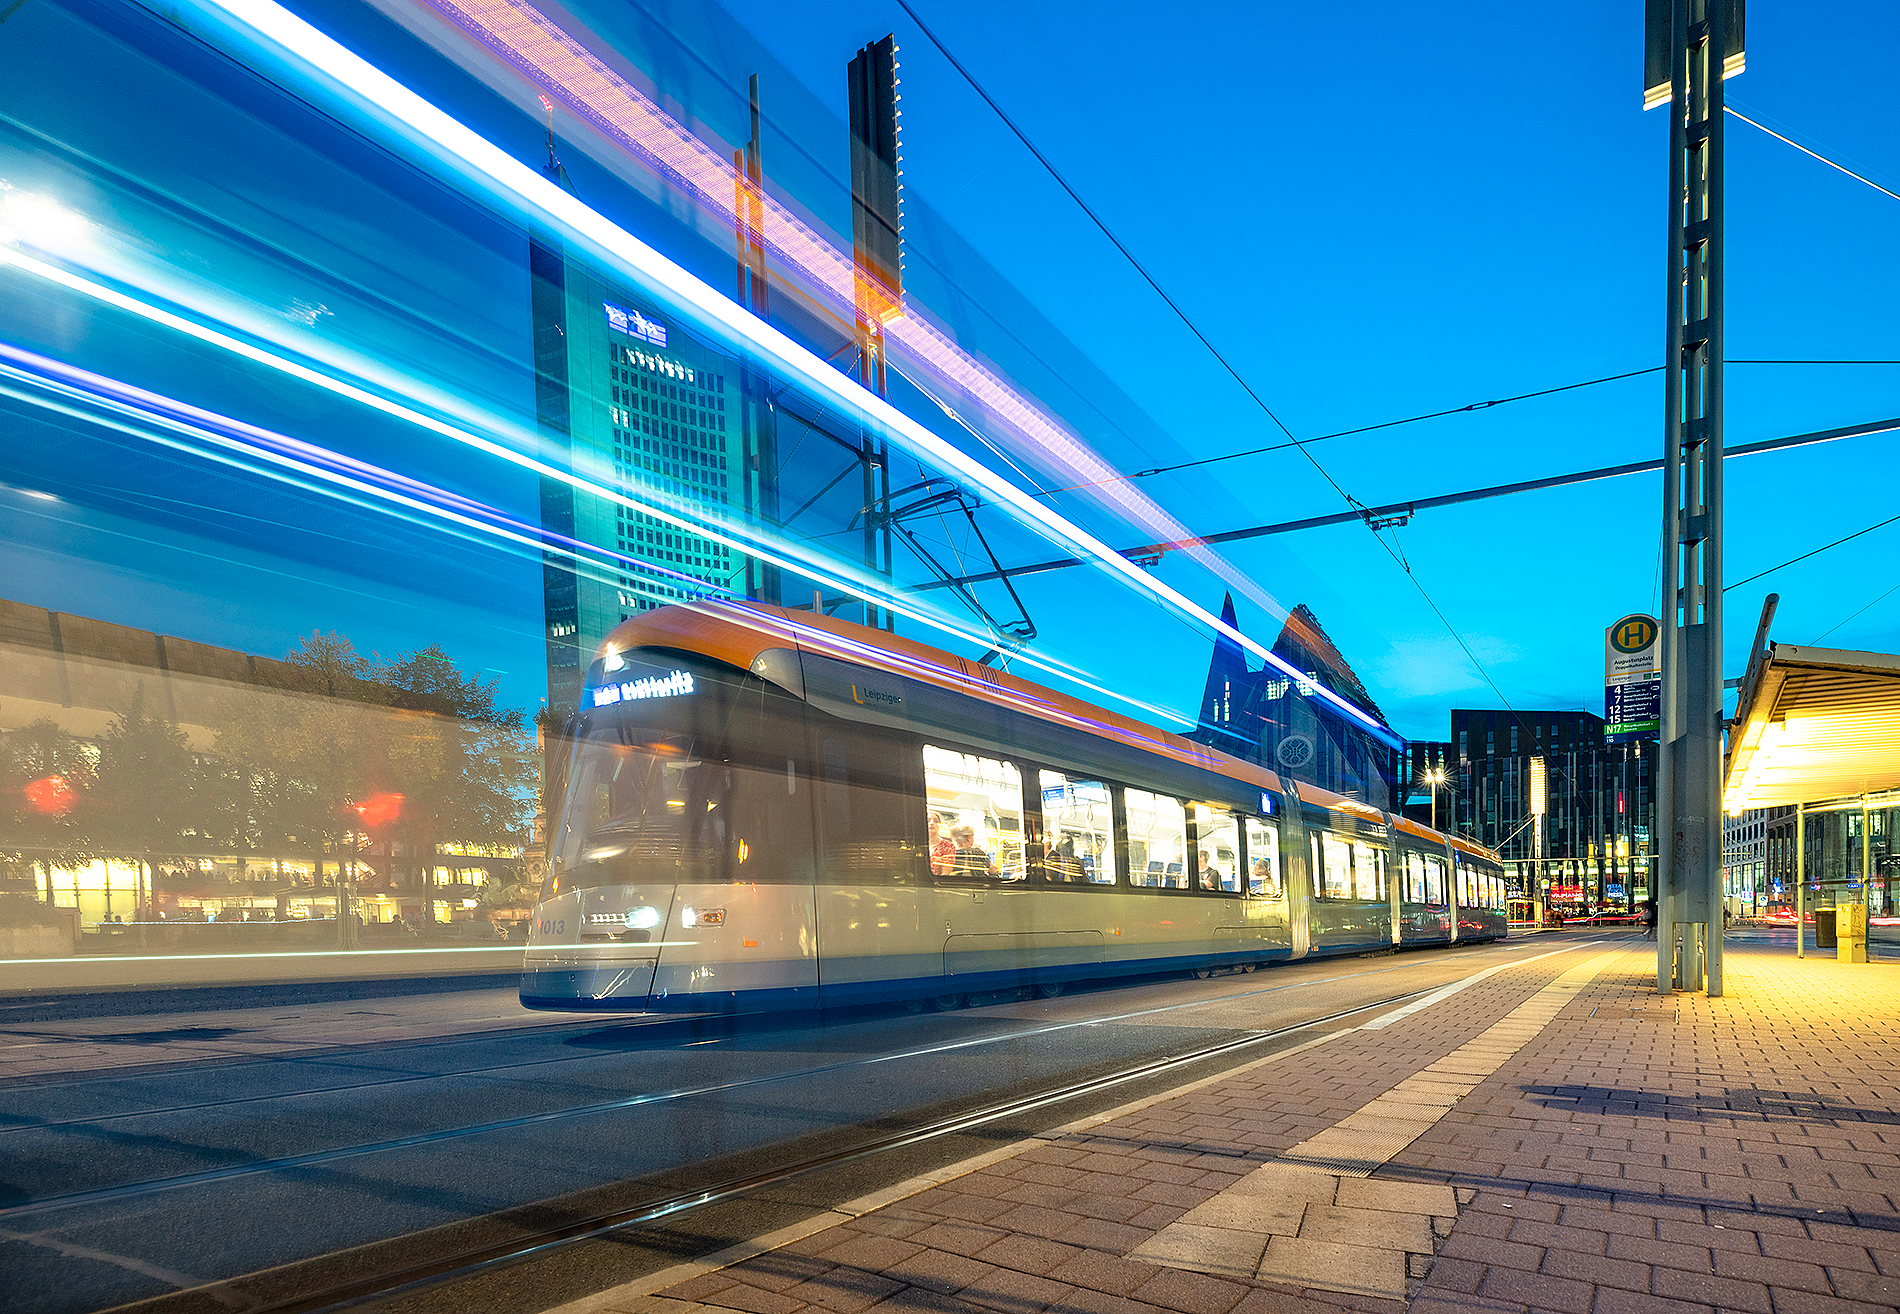 XL-Straßenbahn auf dem Augustusplatz: Allein 2018 beförderten die LVB ca. 156,4 Millionen Fahrgäste.